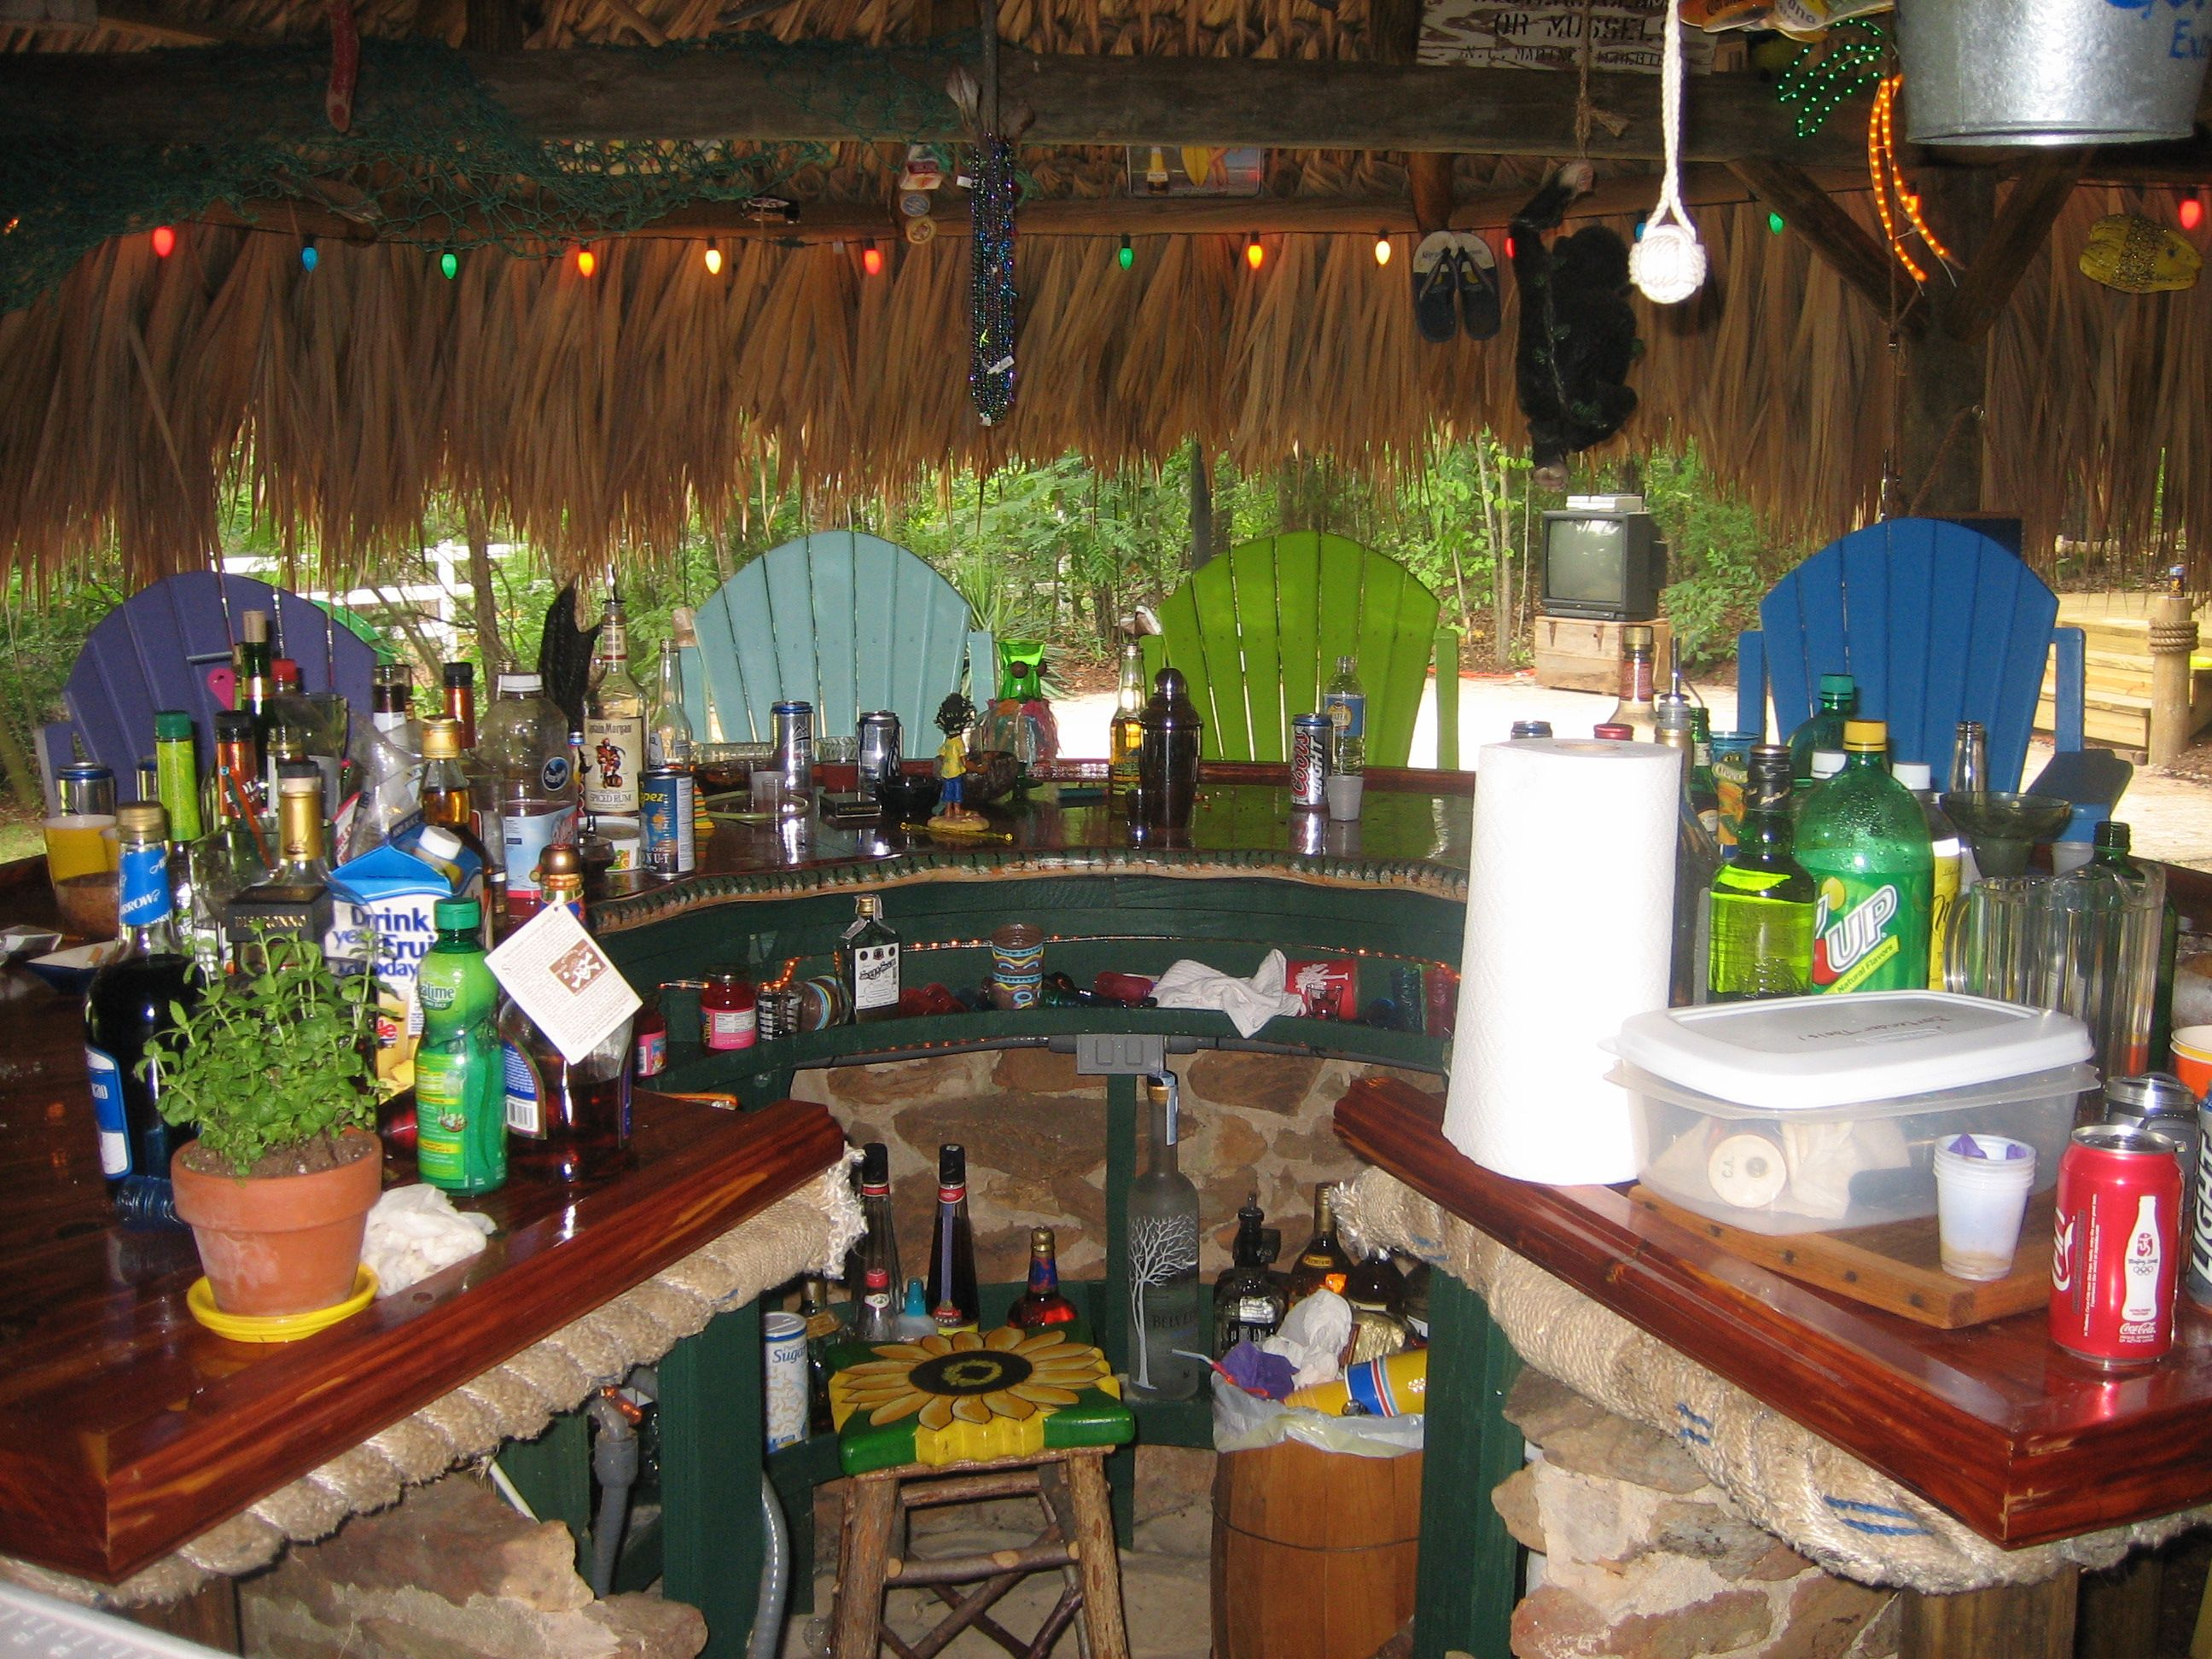 Tiki Bars & Tiki Decorations